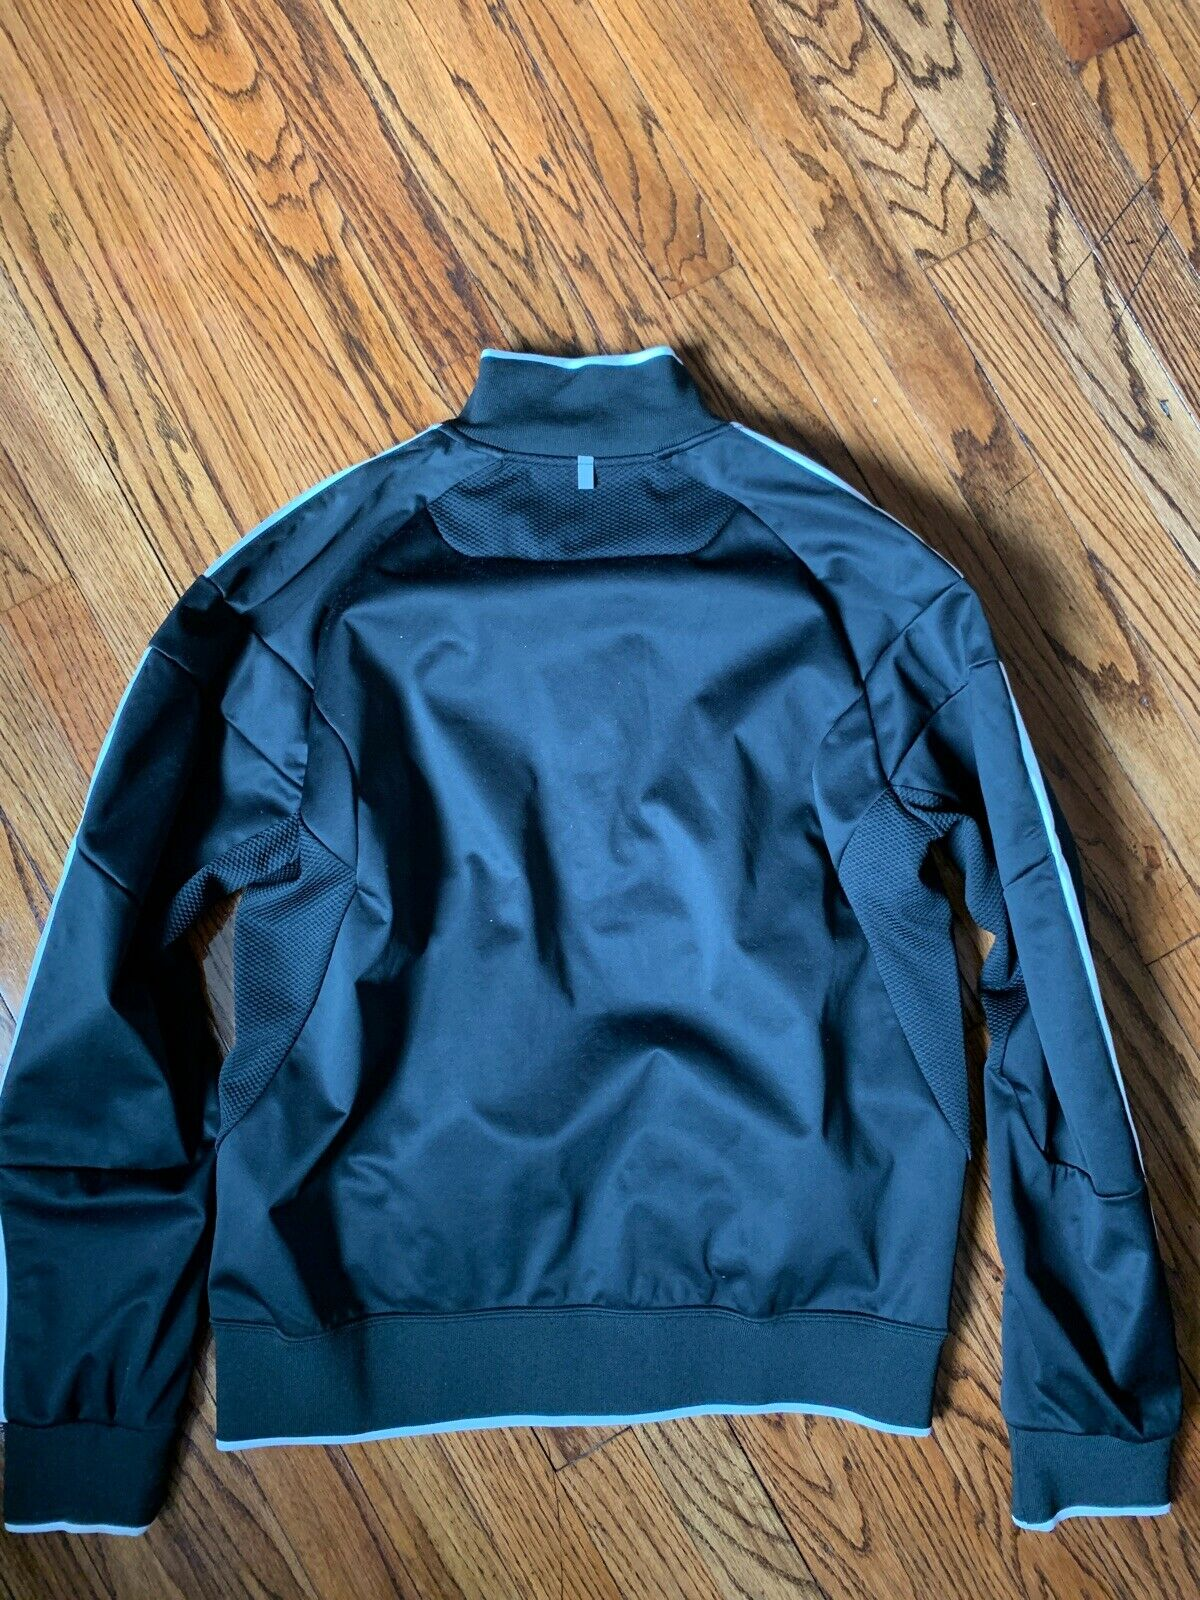 Polo Sport Paneled Microfleece Jacket Multi Sizes /& Colors